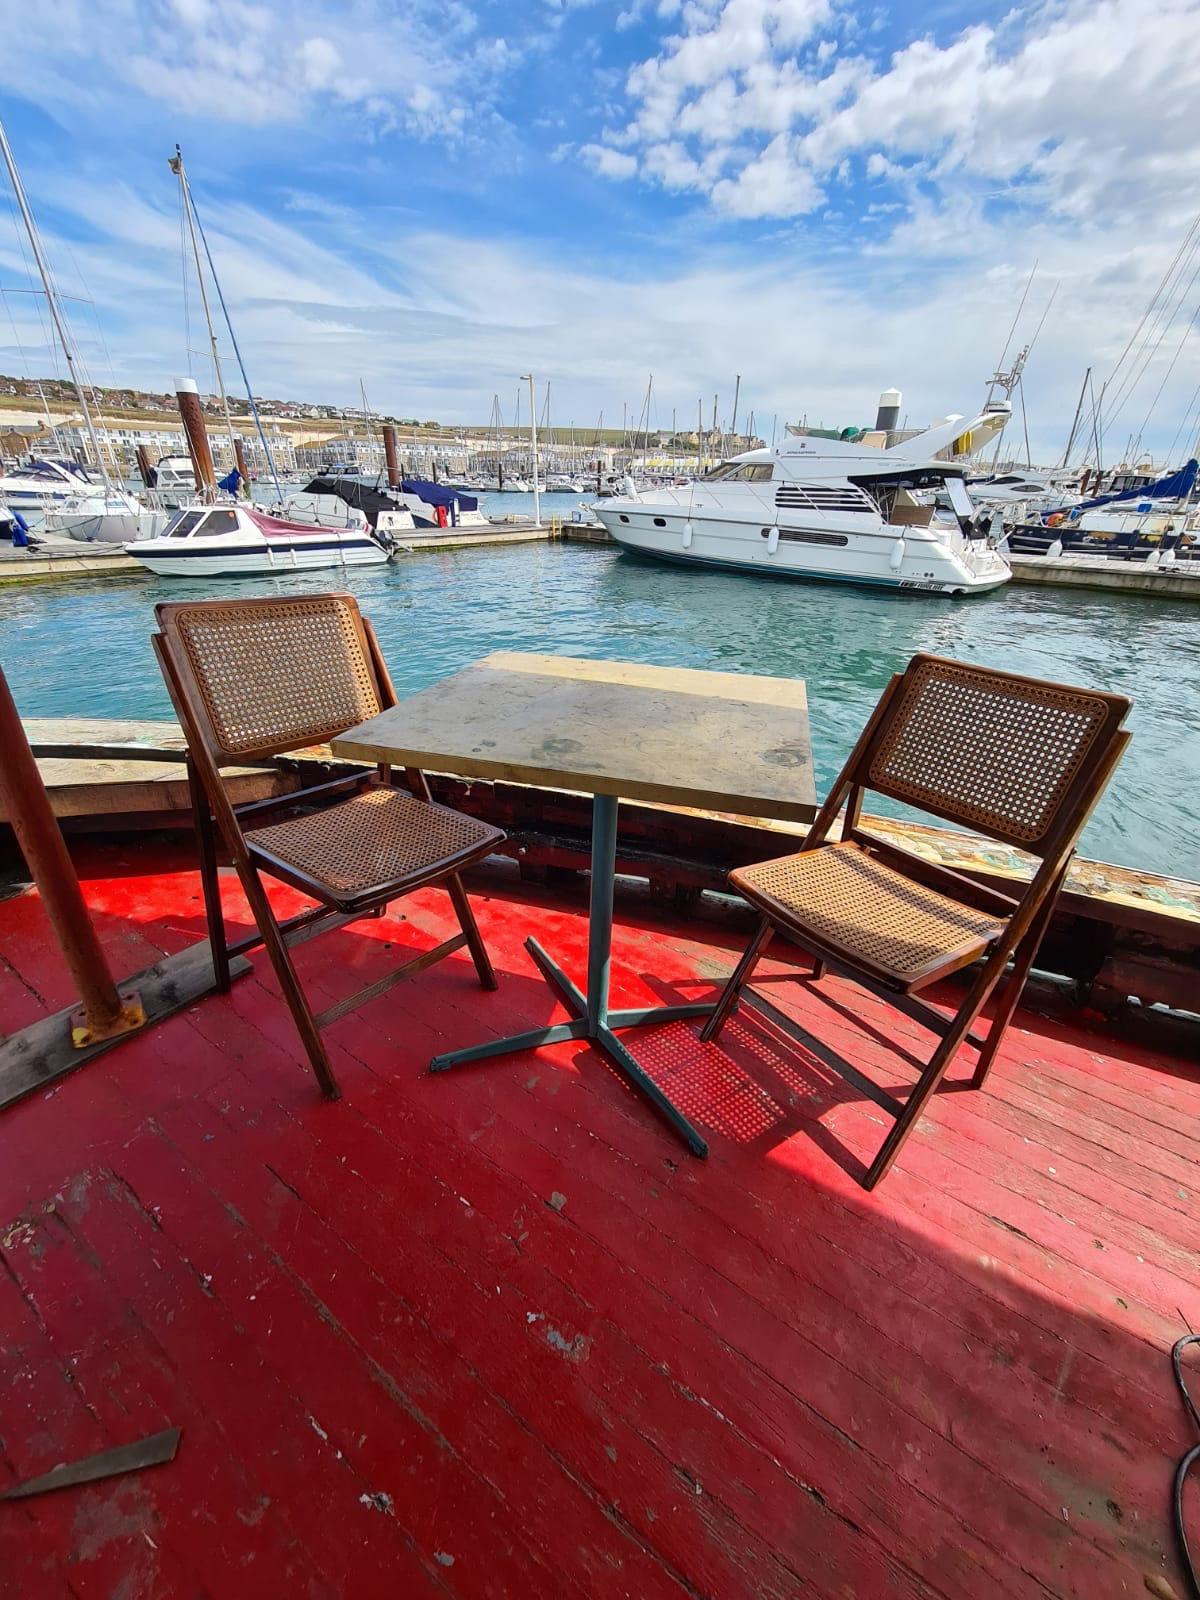 Saturday Workshop On our Brighton Boat